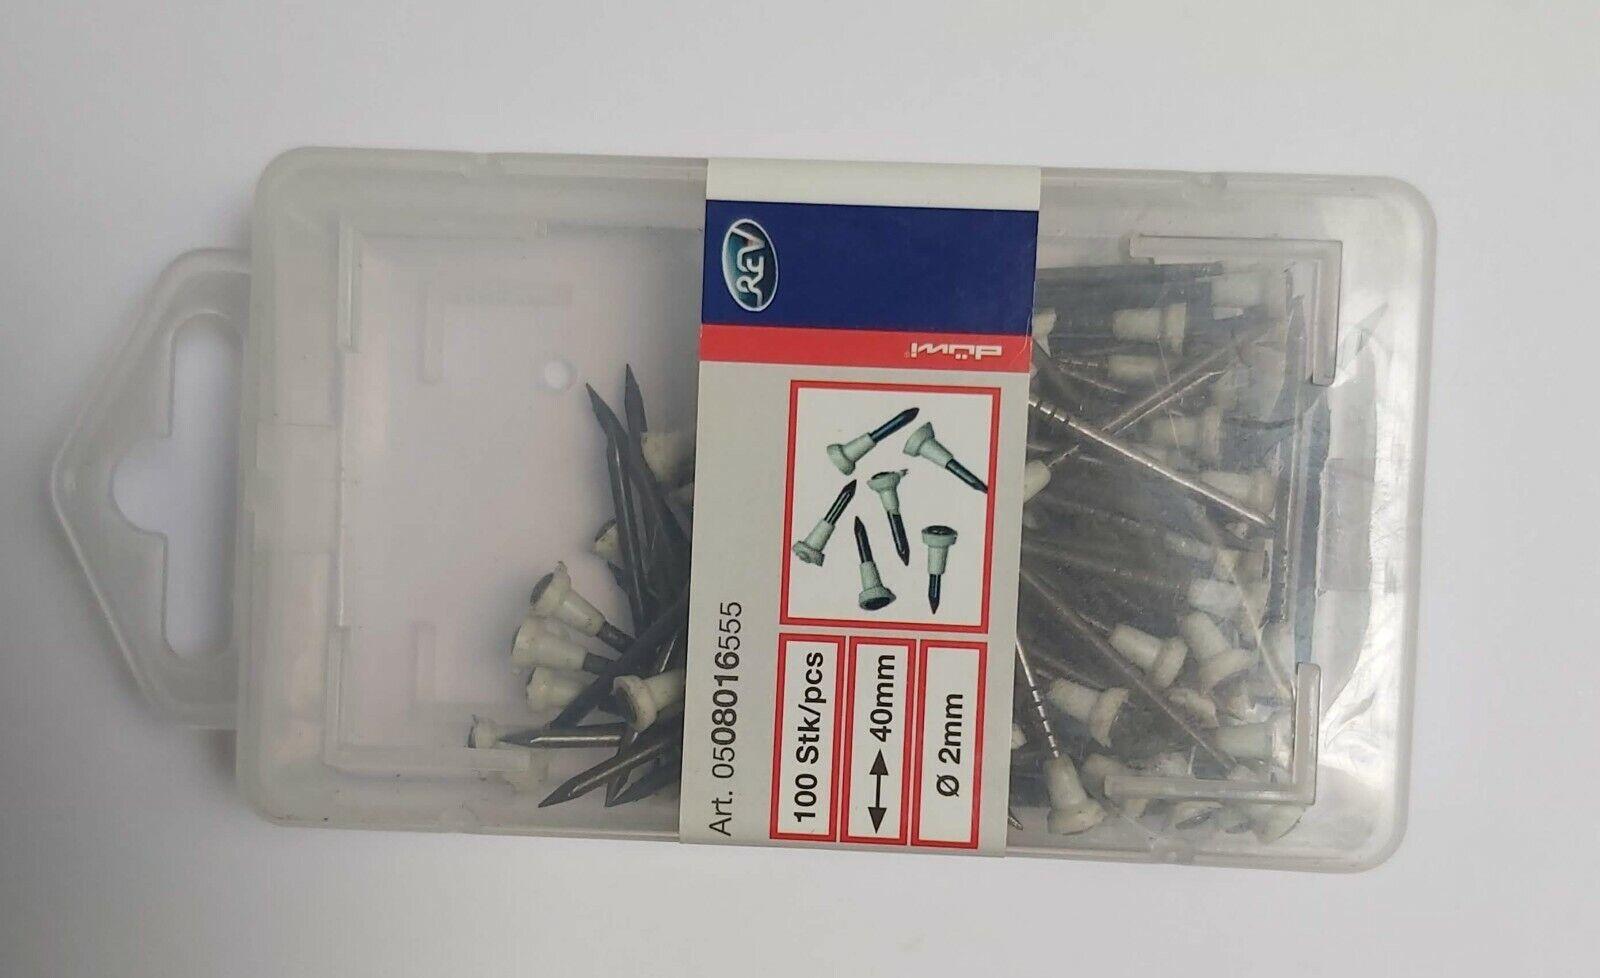 Stegleitungs-Stahlnagel 16mm Ø 2mm 100 Stück Stegleitungsnägel Nagel aus Stahl